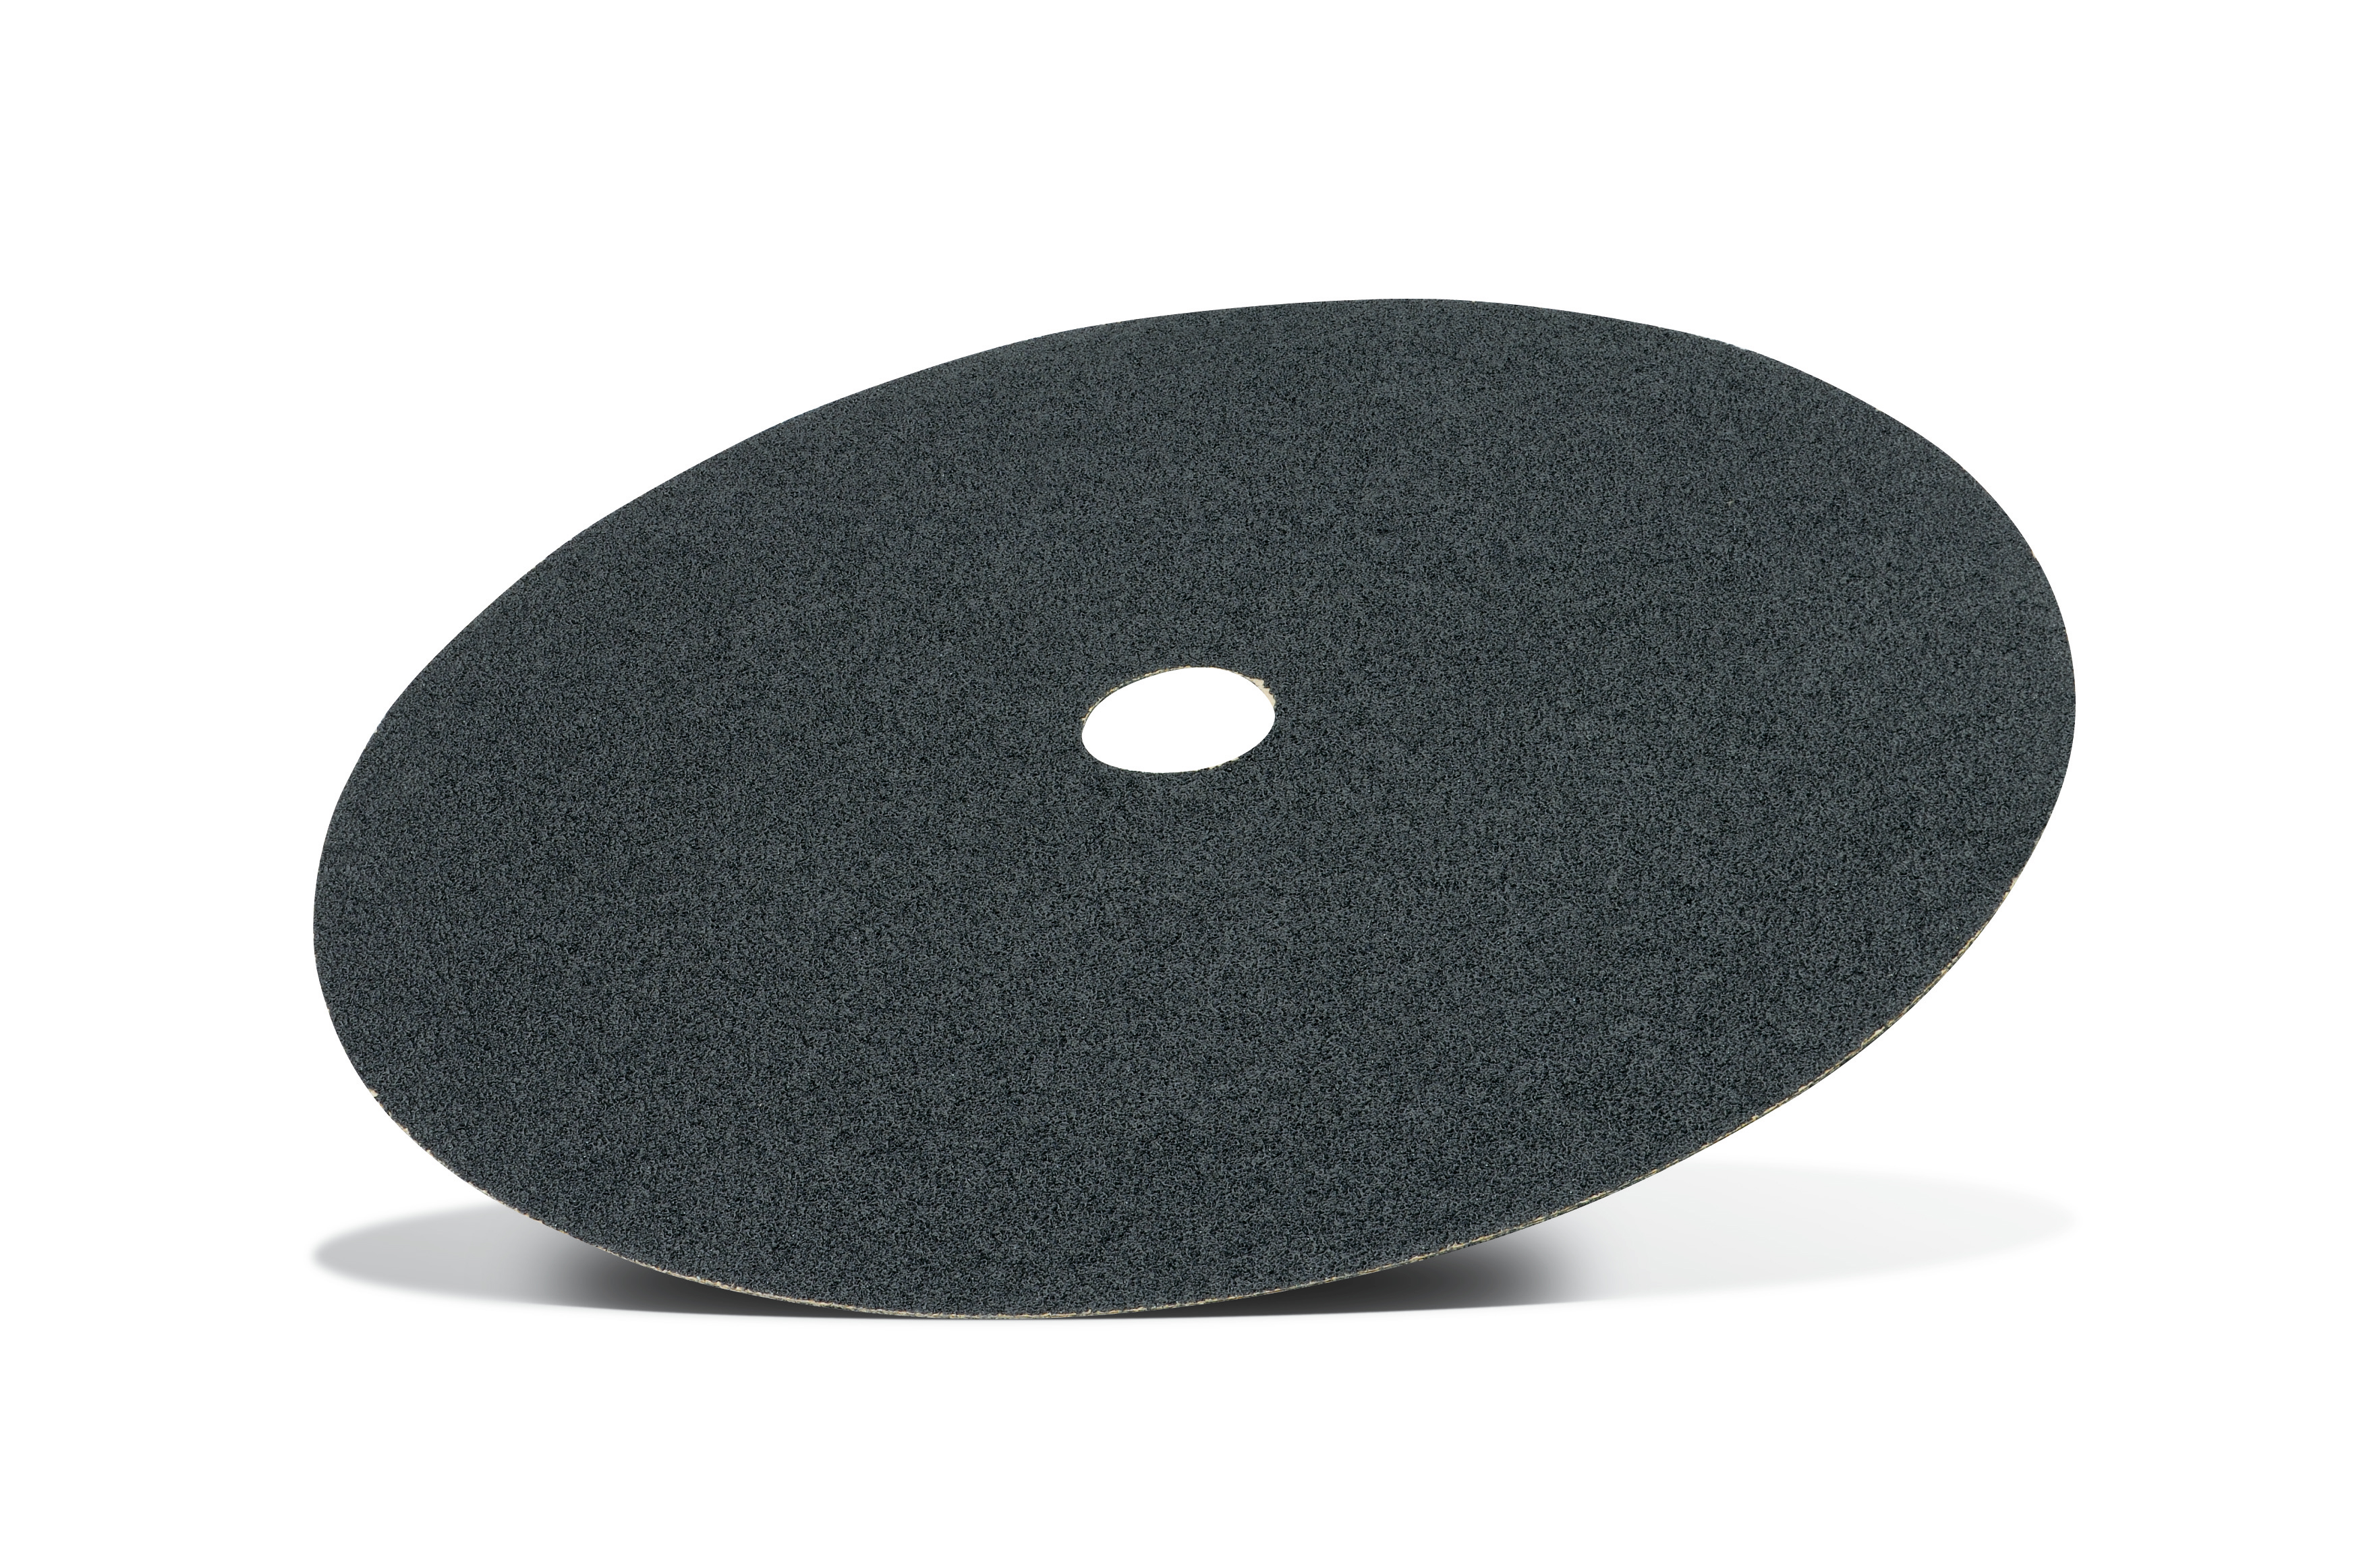 Abrasive paper disc, 430 mm dia. Pajarito